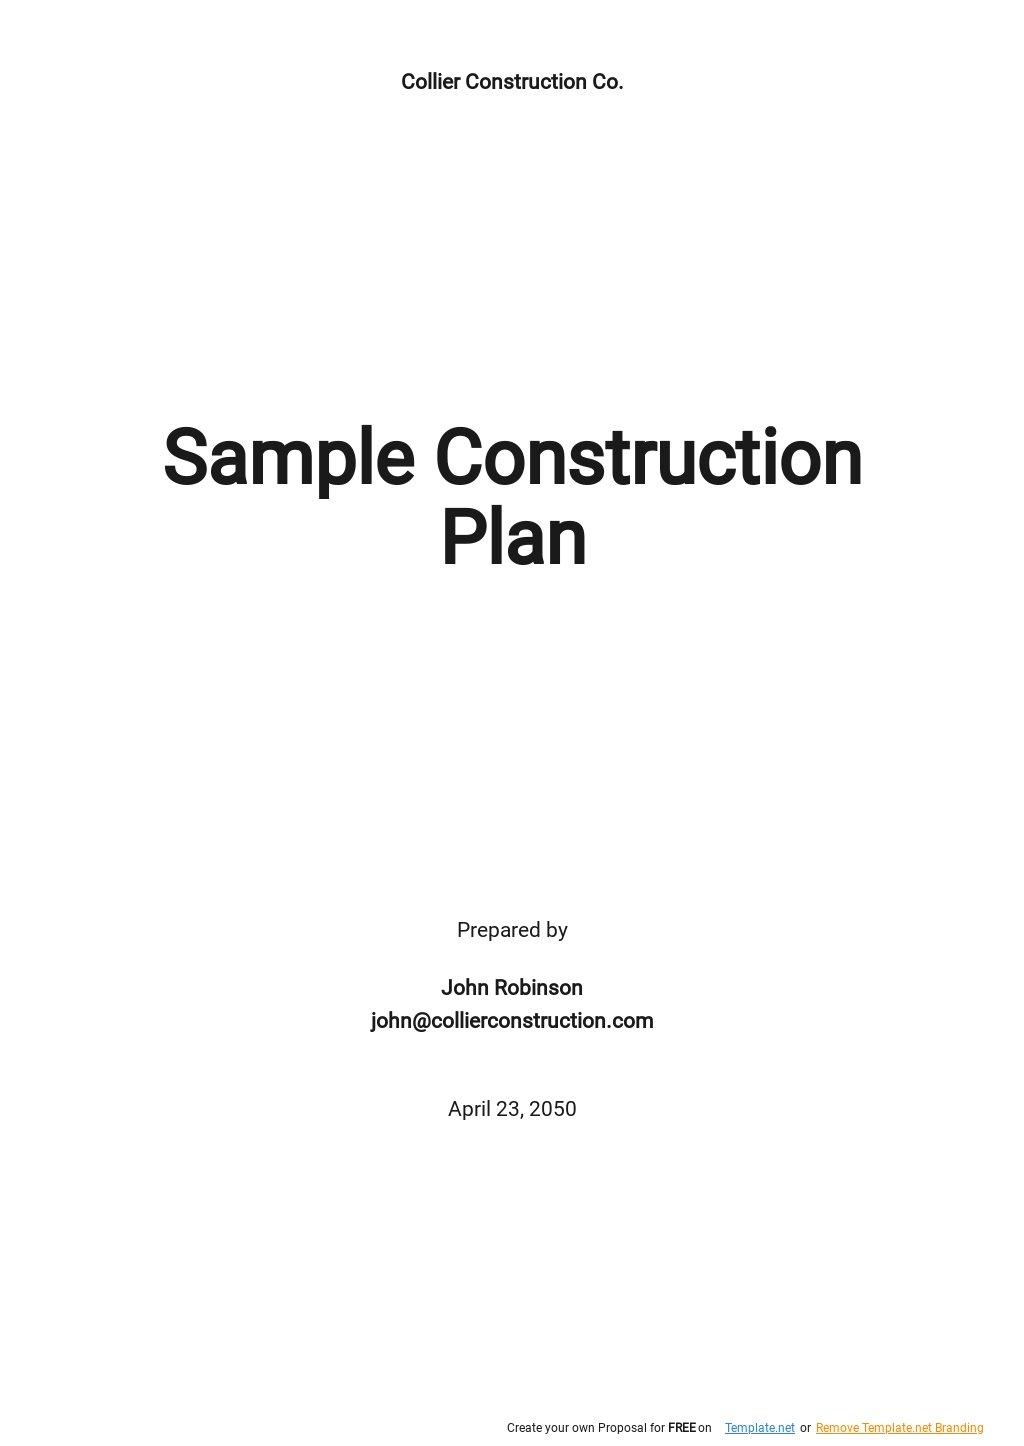 Sample Construction Plan Template.jpe